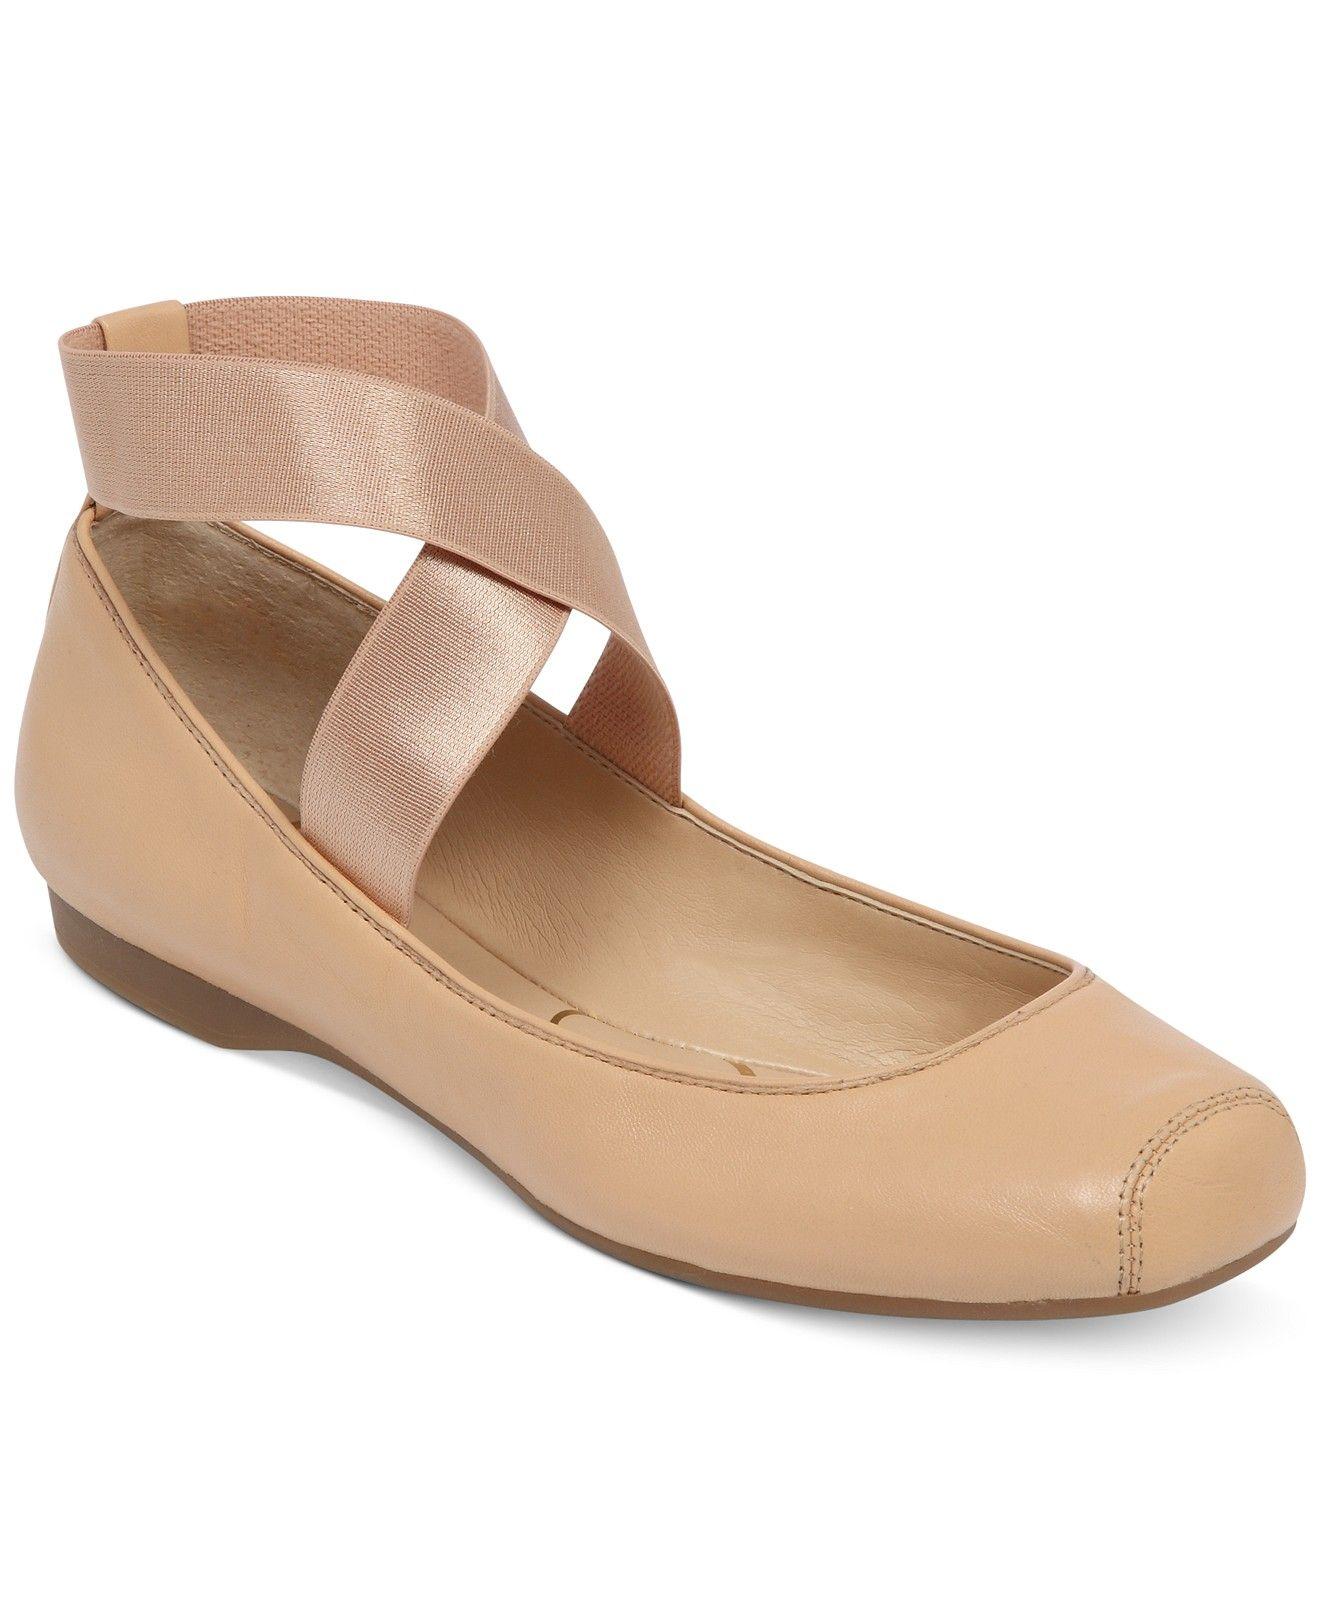 Jessica simpson mandalaye elastic ballet flats shoes macyus my